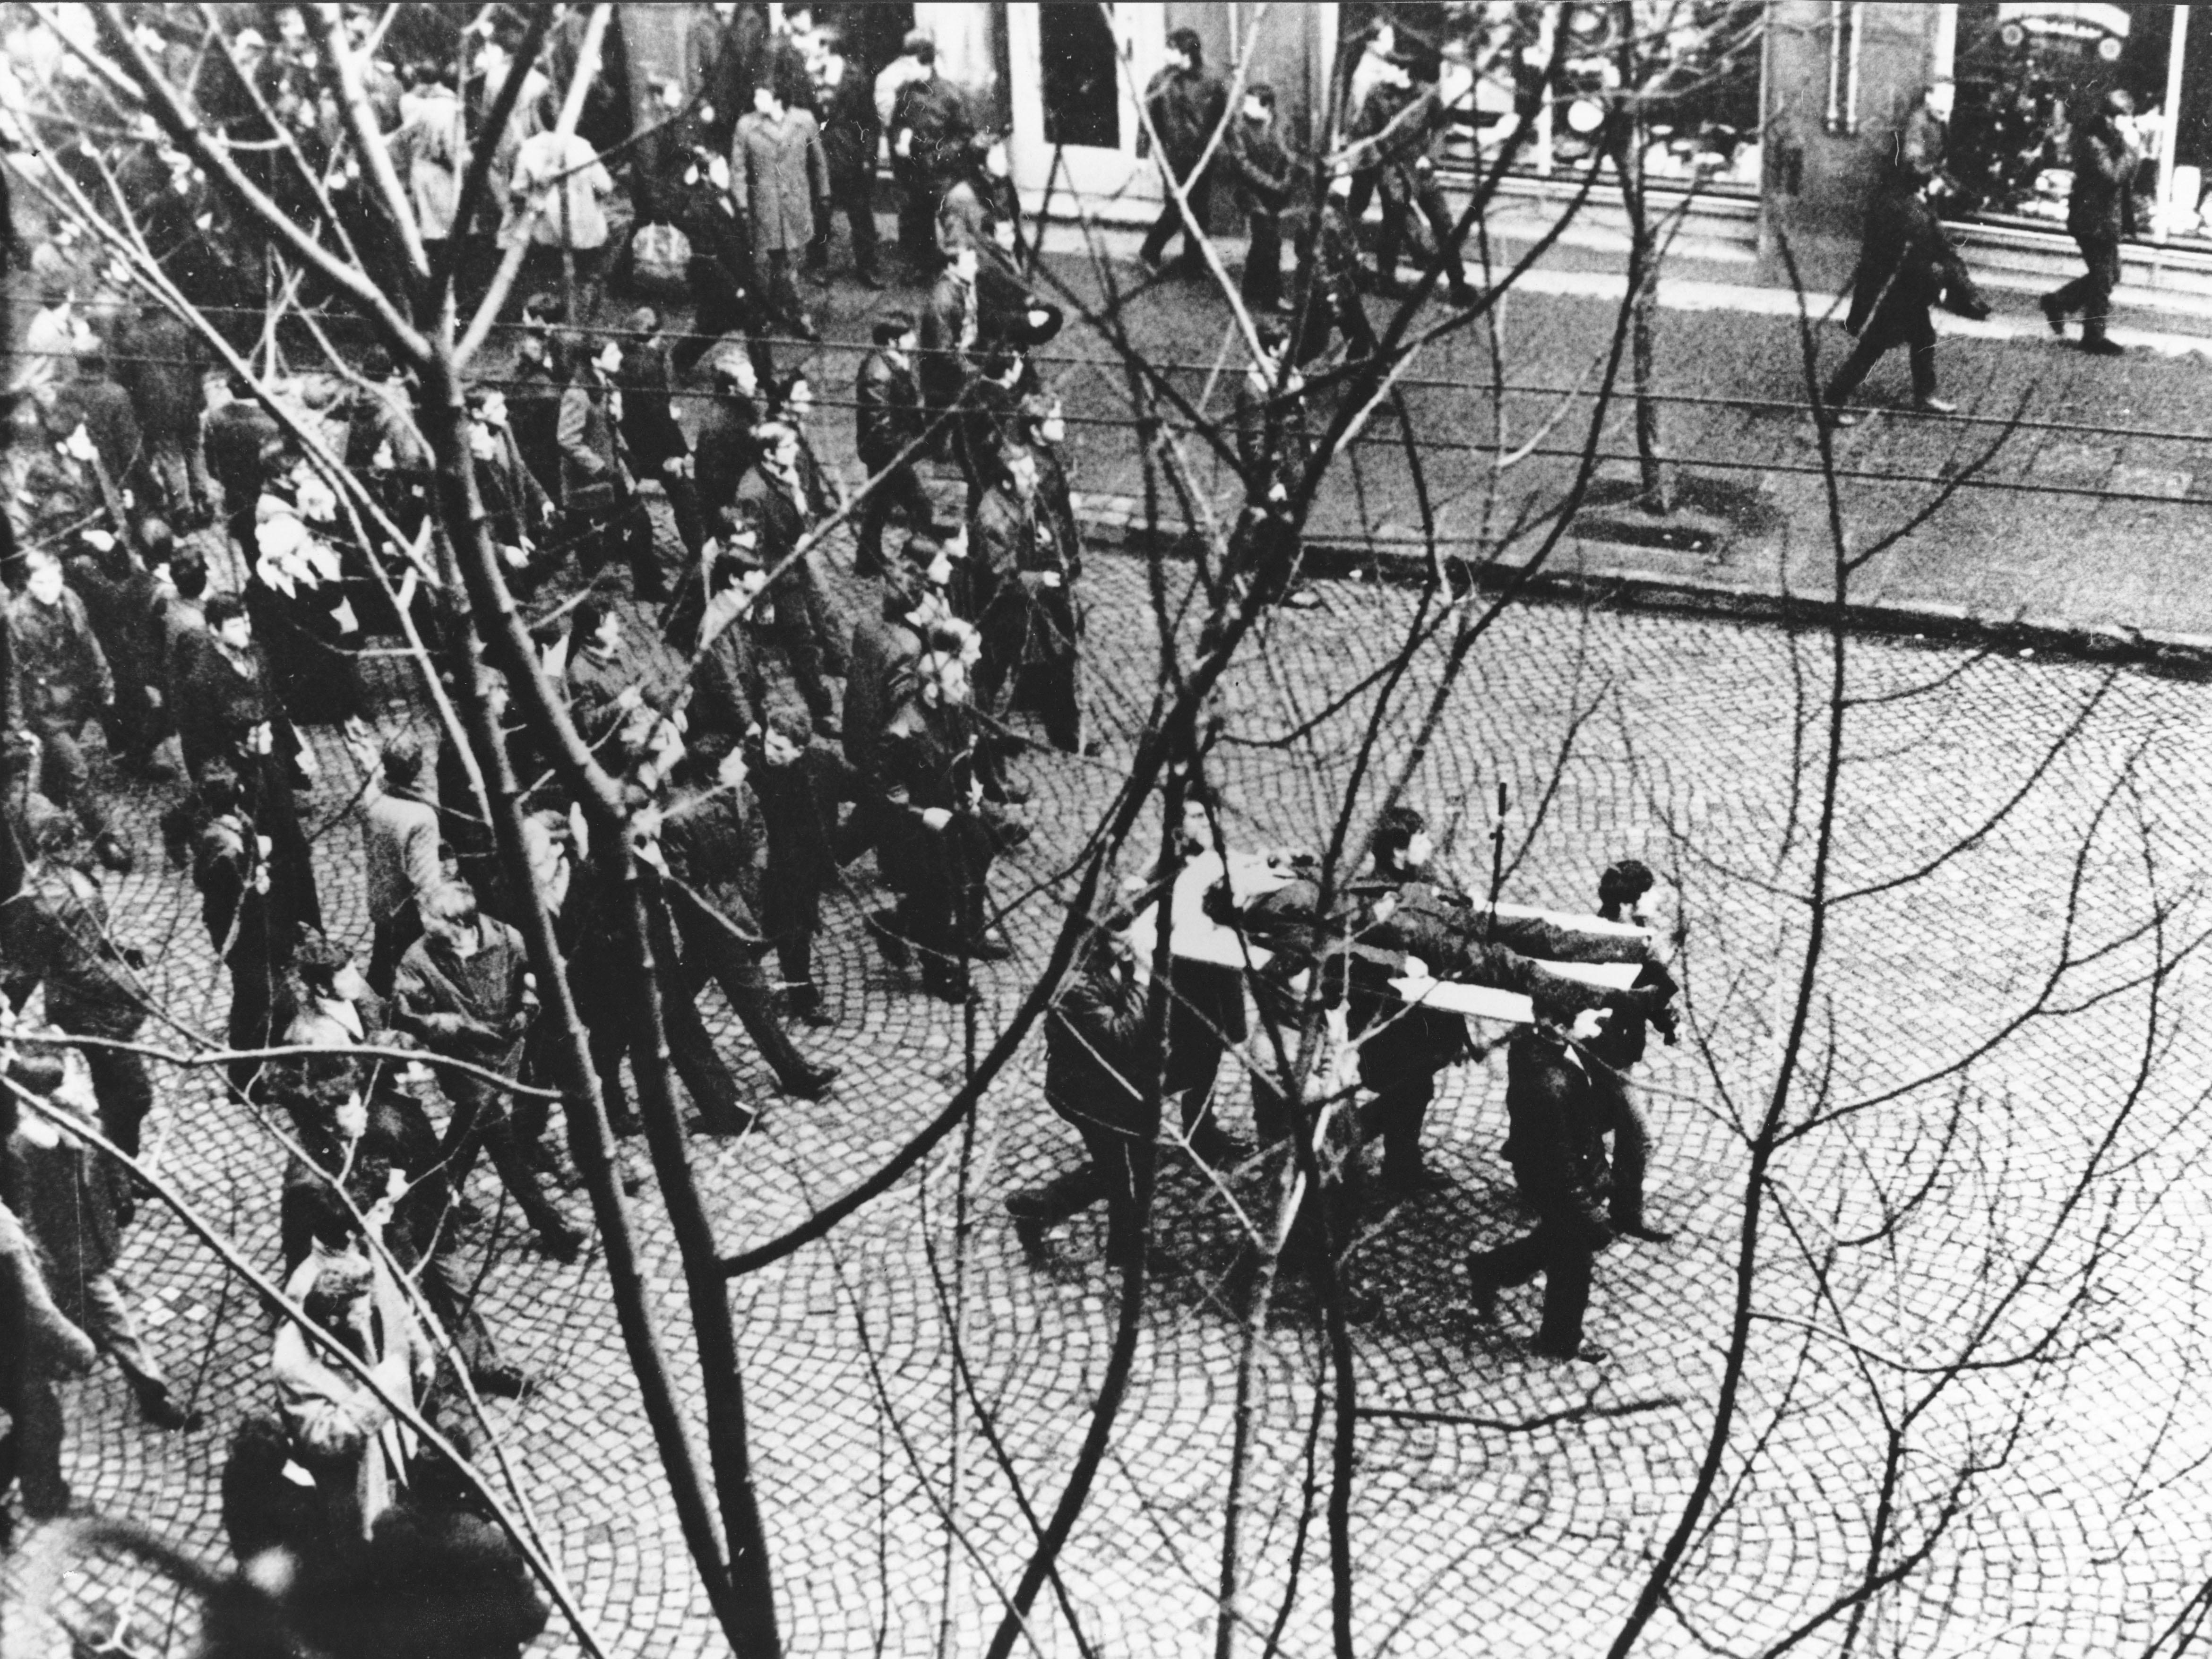 a1d8d0ccb46e Волнения в Польше (1970—1971) — Википедия